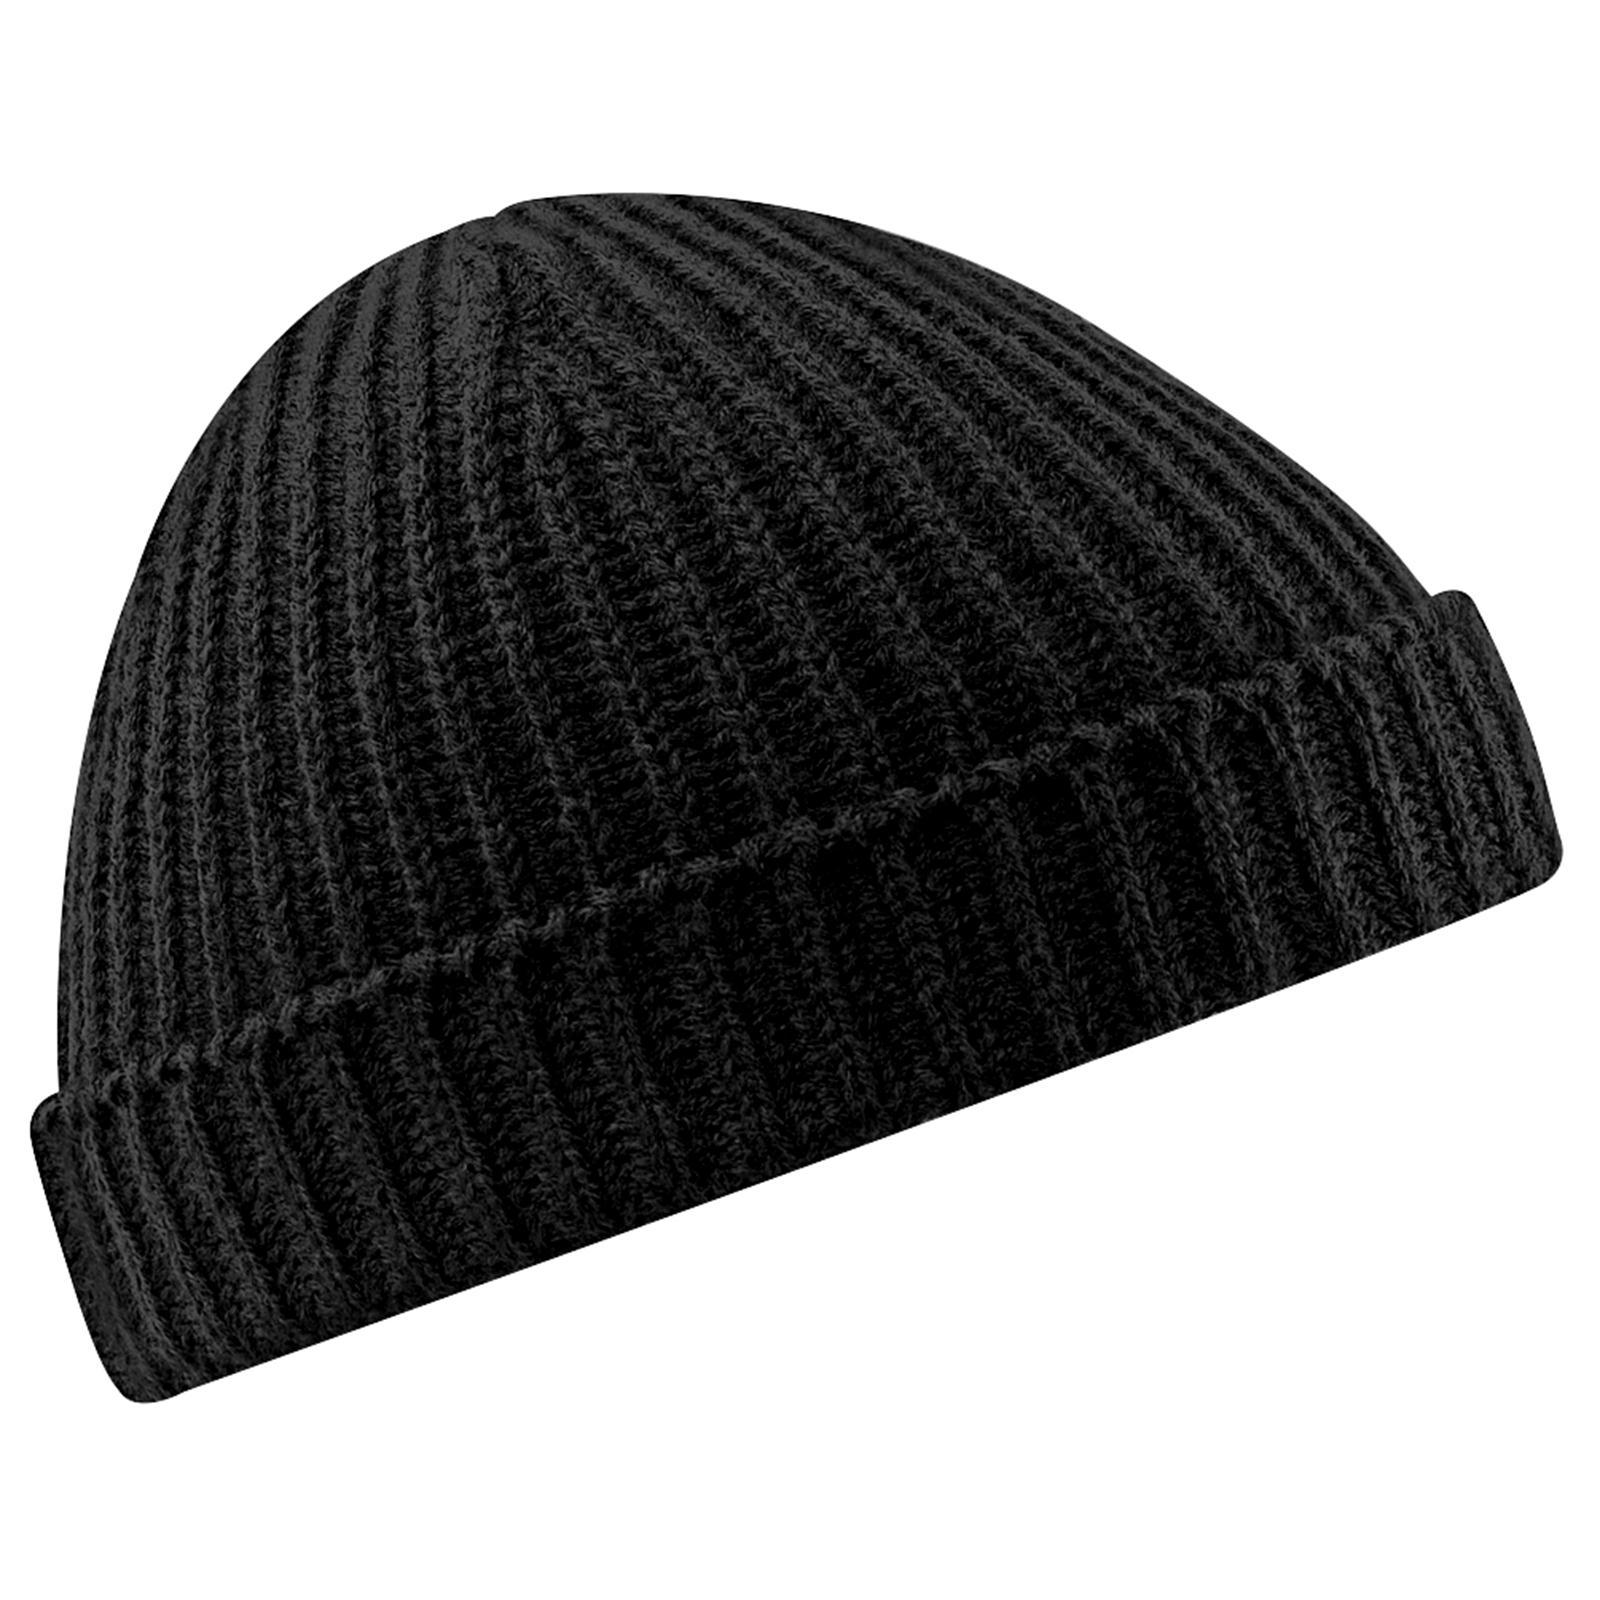 New-BEECHFIELD-Unisex-Retro-Fashion-Fisherman-Trawler-Knit-Beanie-Hat-6-Colours